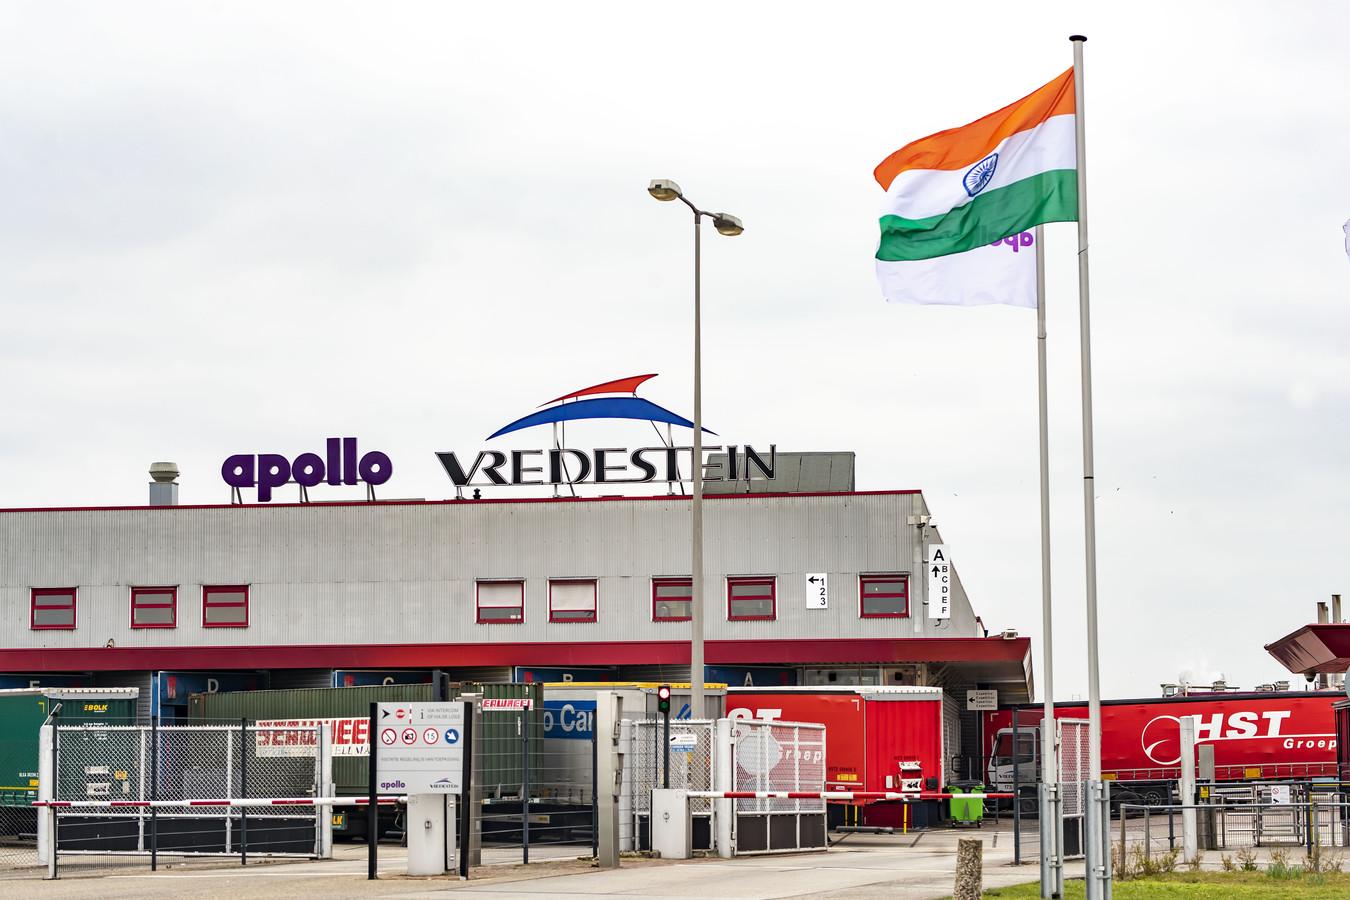 Bij Apollo Vredestein in Enschede dreigt een massa-ontslag.